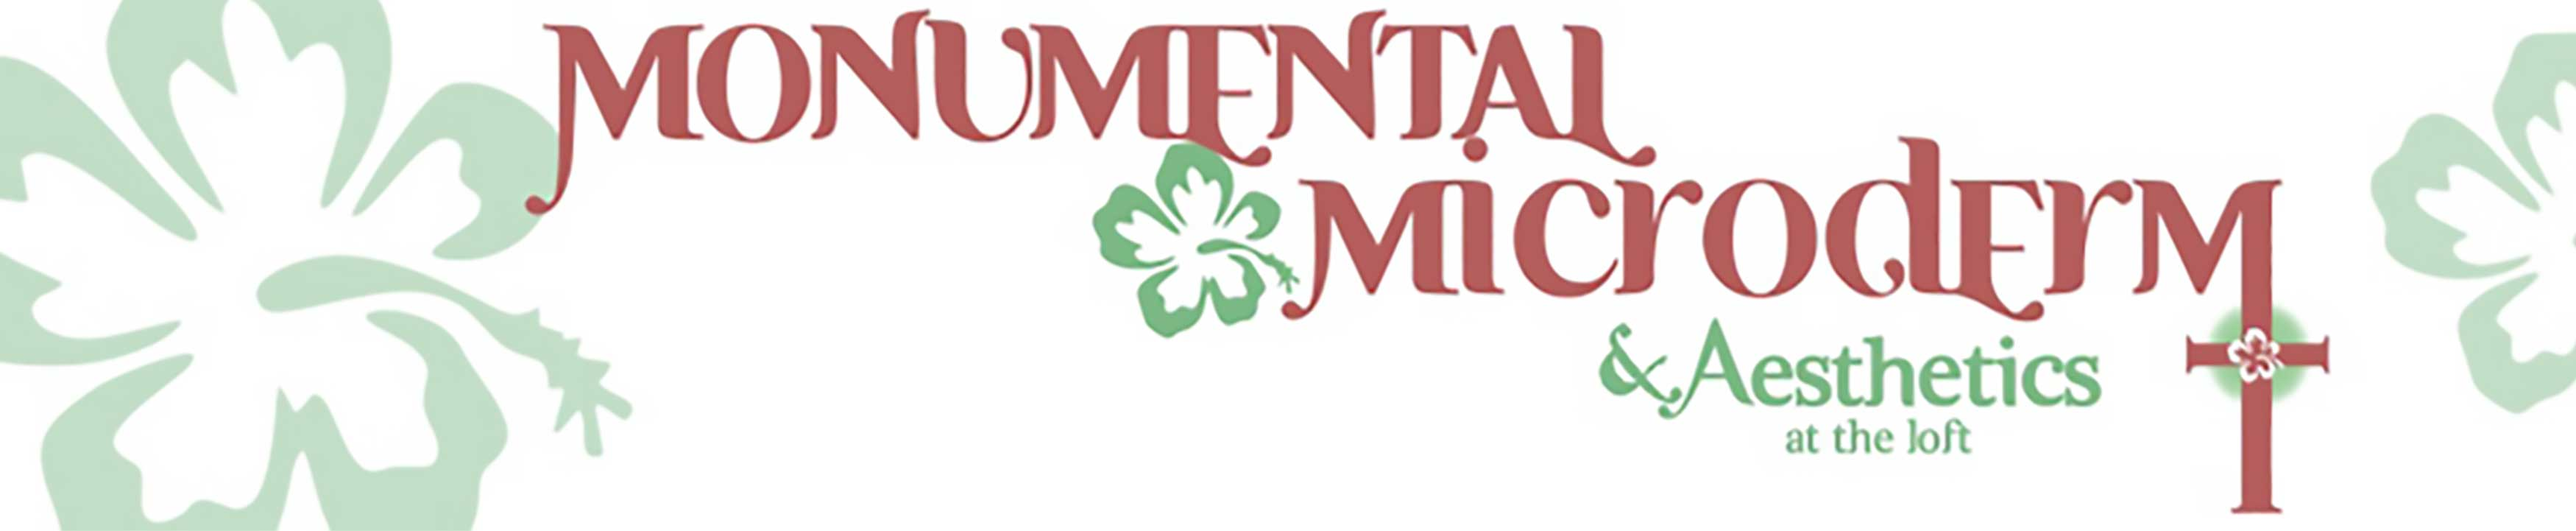 Monumental Microderm